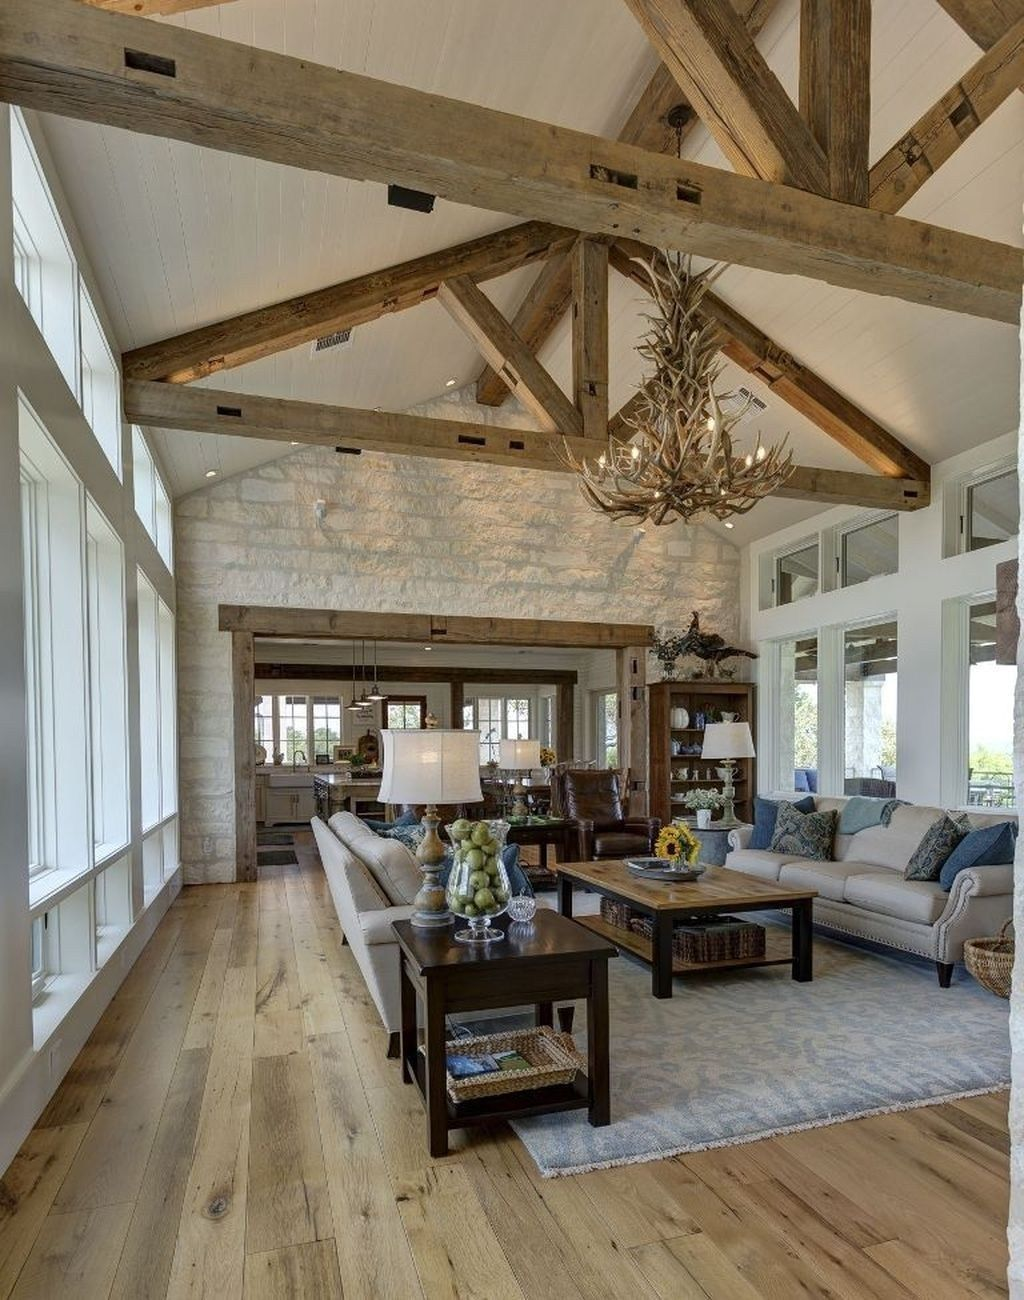 38 Elegant Old Farmhouse Design Ideas To Get Classic